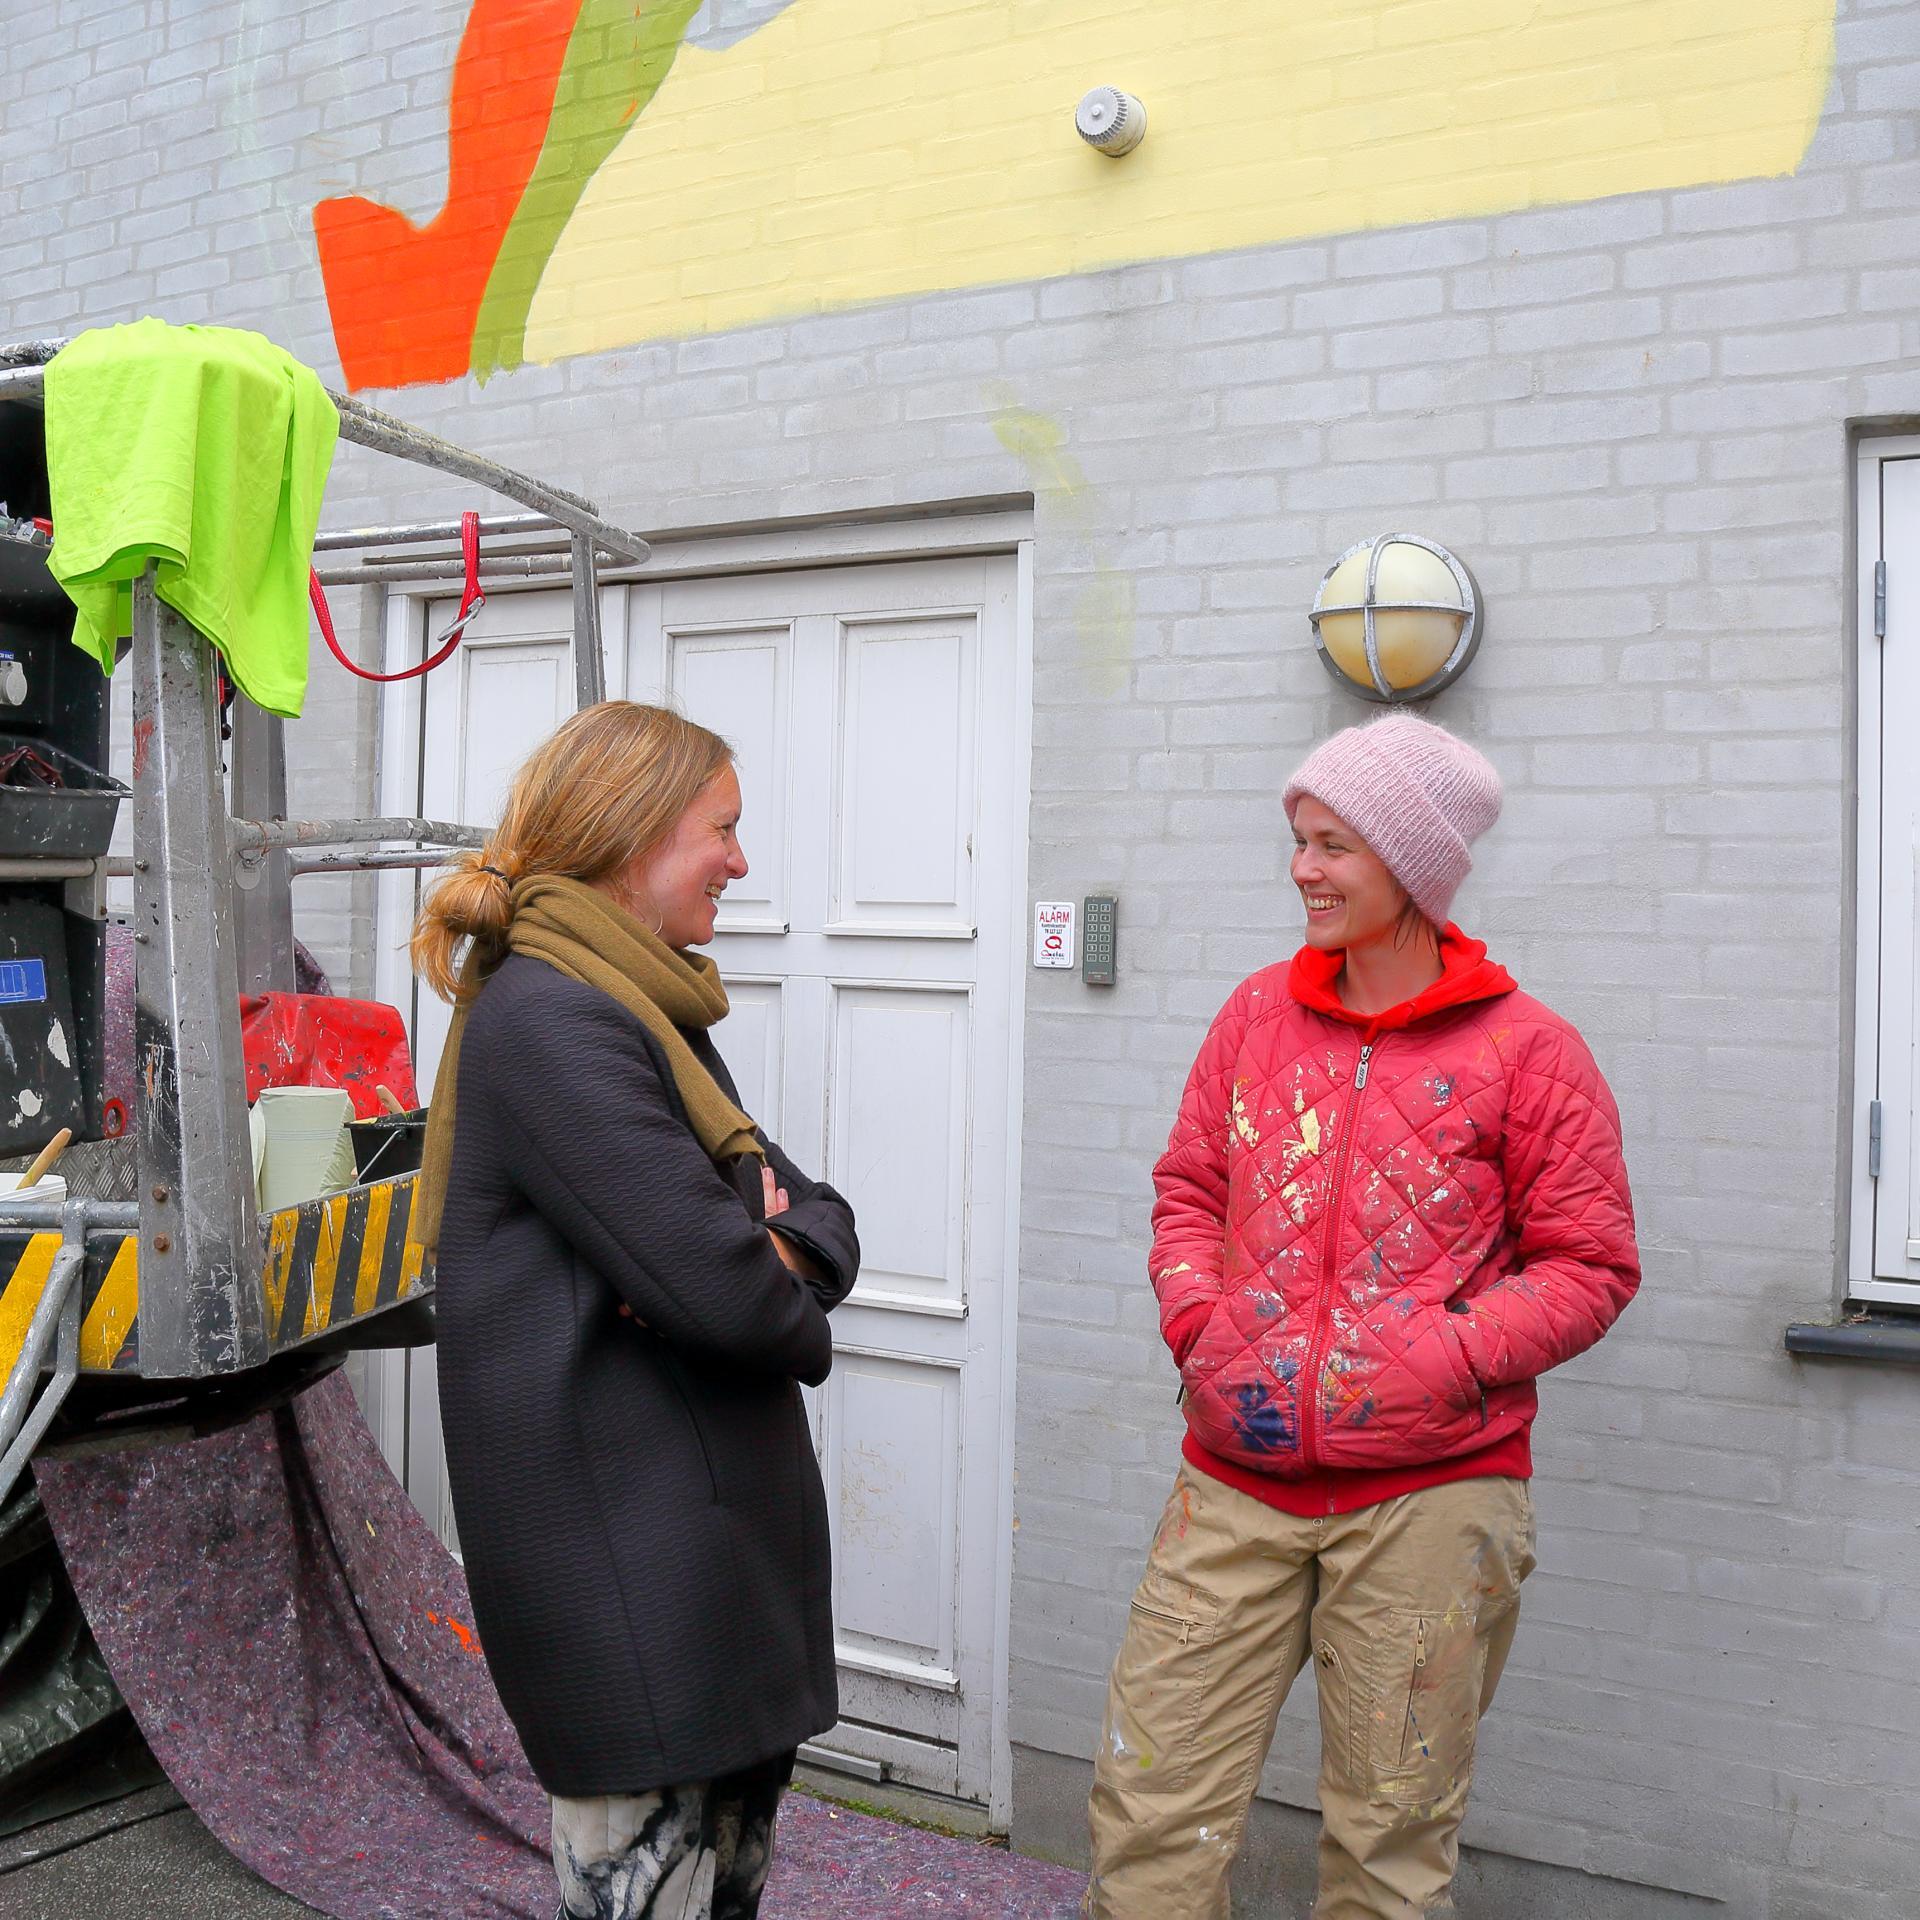 2020_Holbæk Art_Emily Gernild_Torben Papillon_5896 (3)-web